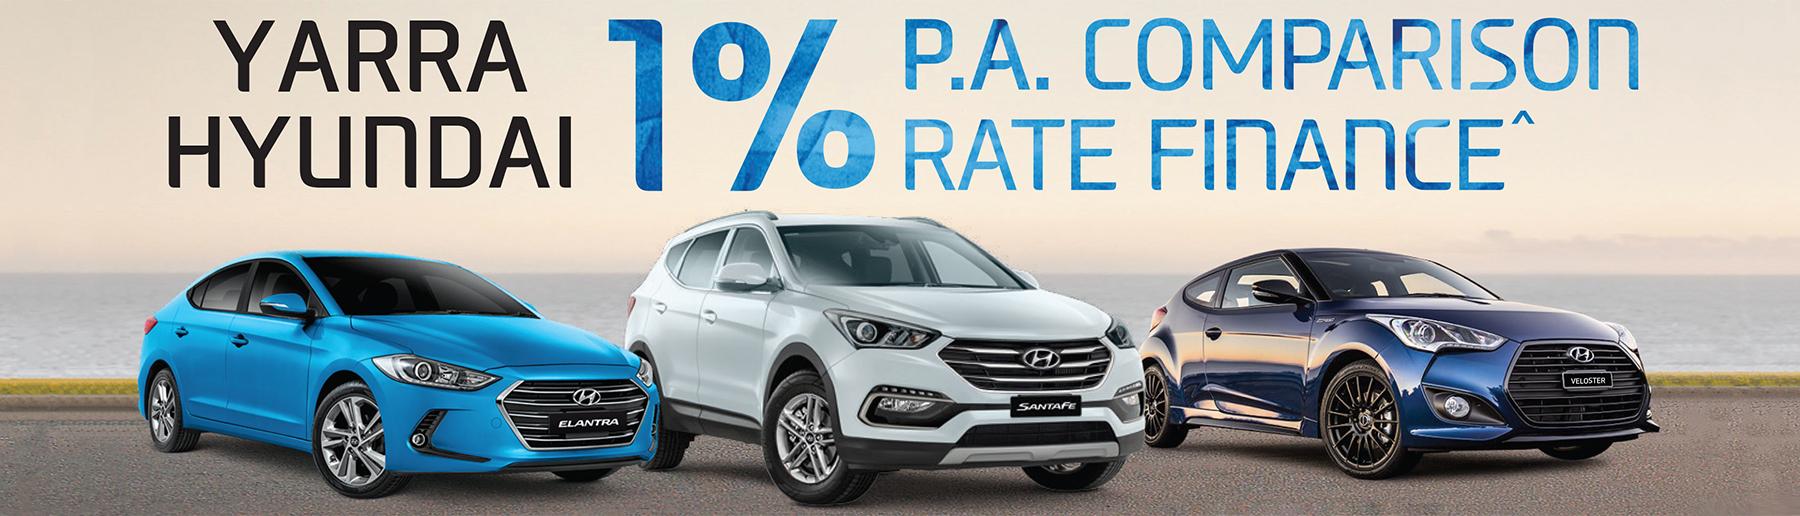 Yarra Hyundai 1% pa Comparison Rate Finance